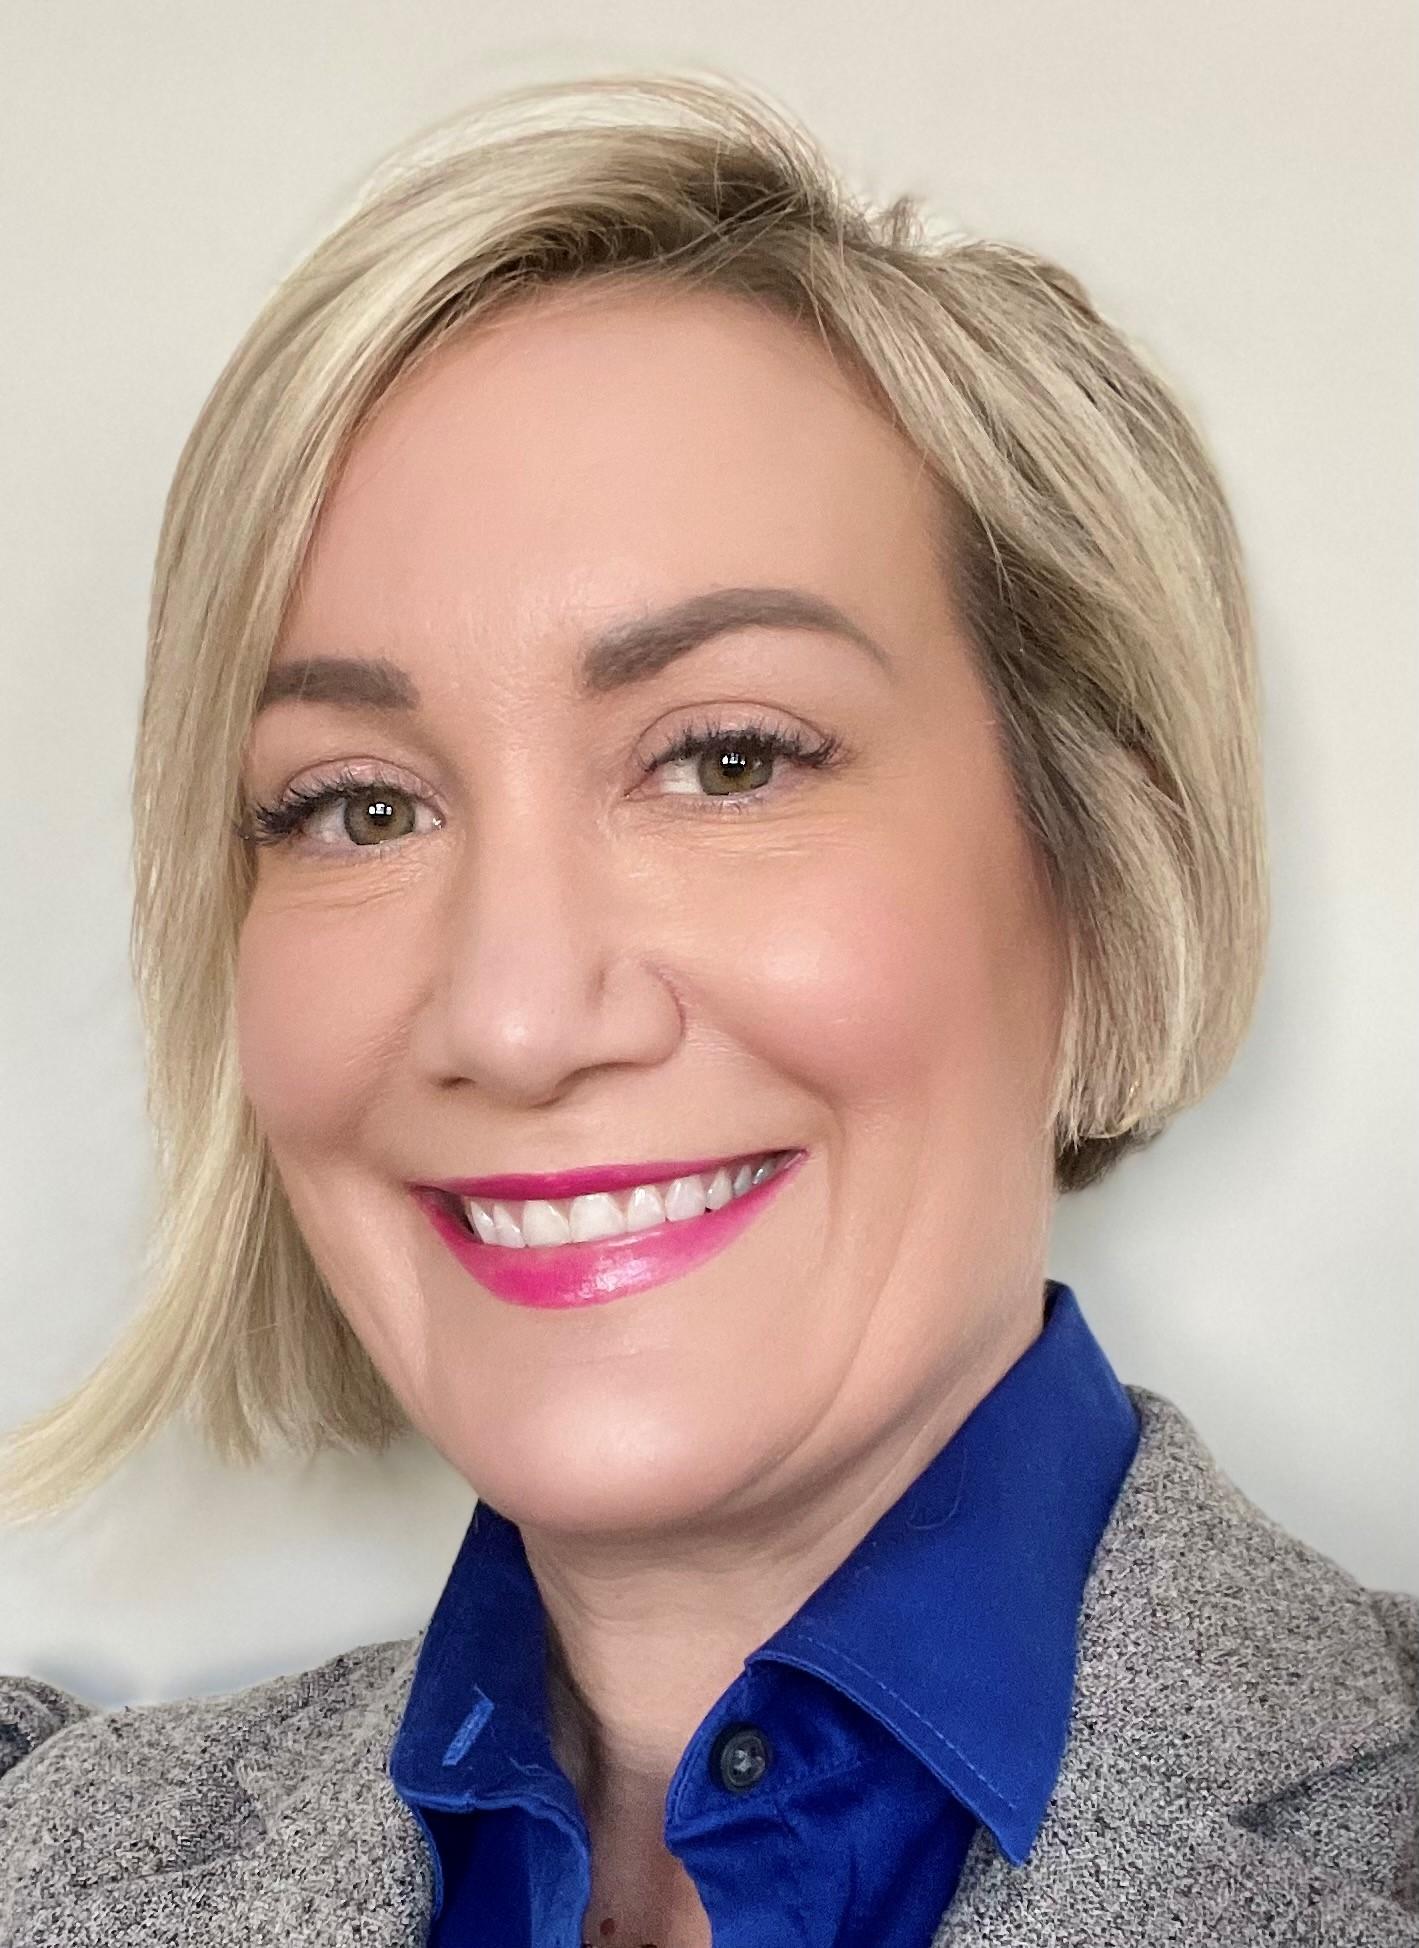 Sarah Krebs, Region 3 Liaison